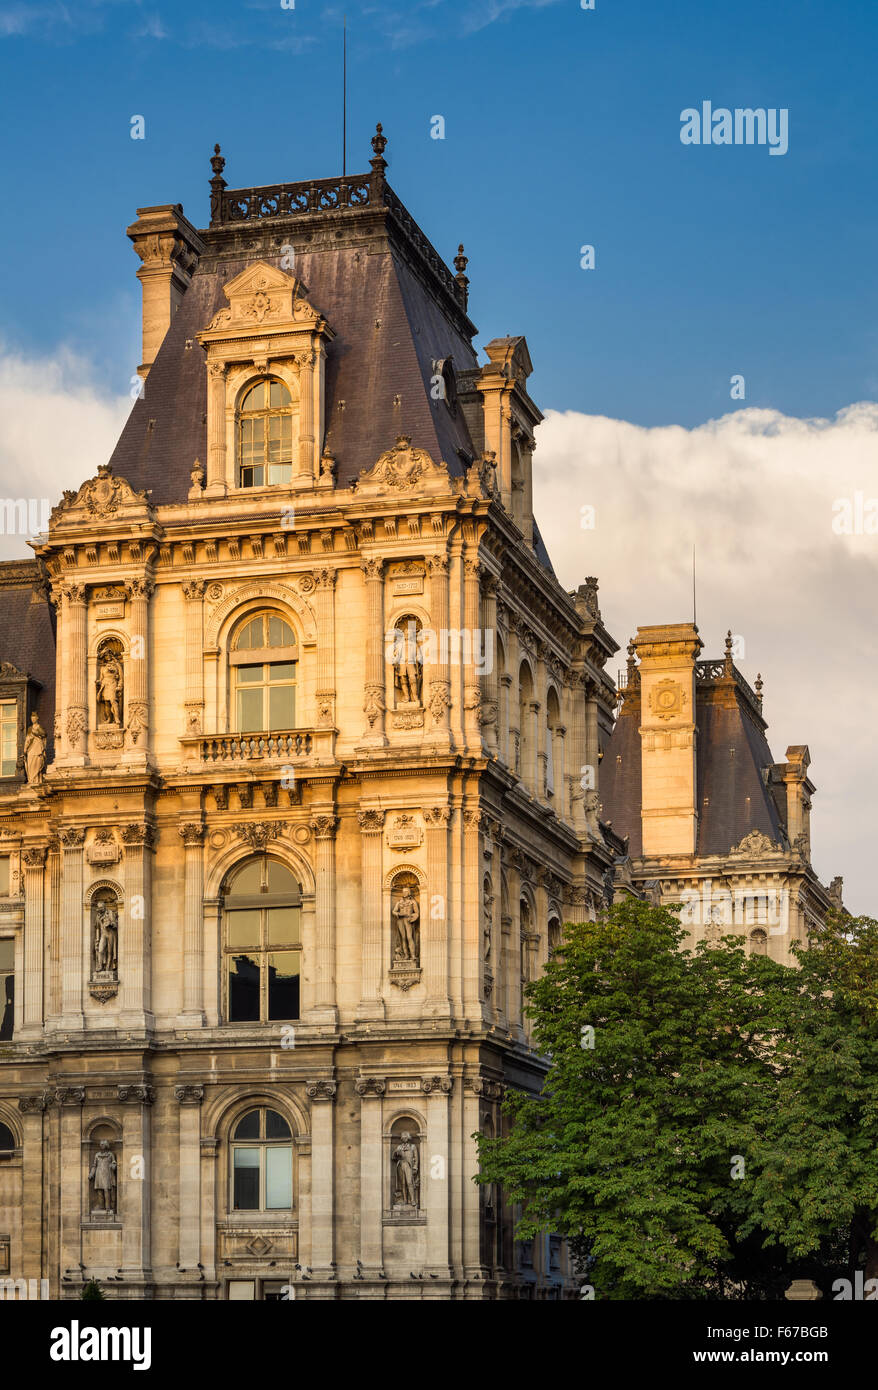 Detail of Renaissance Revival Paris City Hall facade before sunset. Statues recognize historically important Parisians. - Stock Image